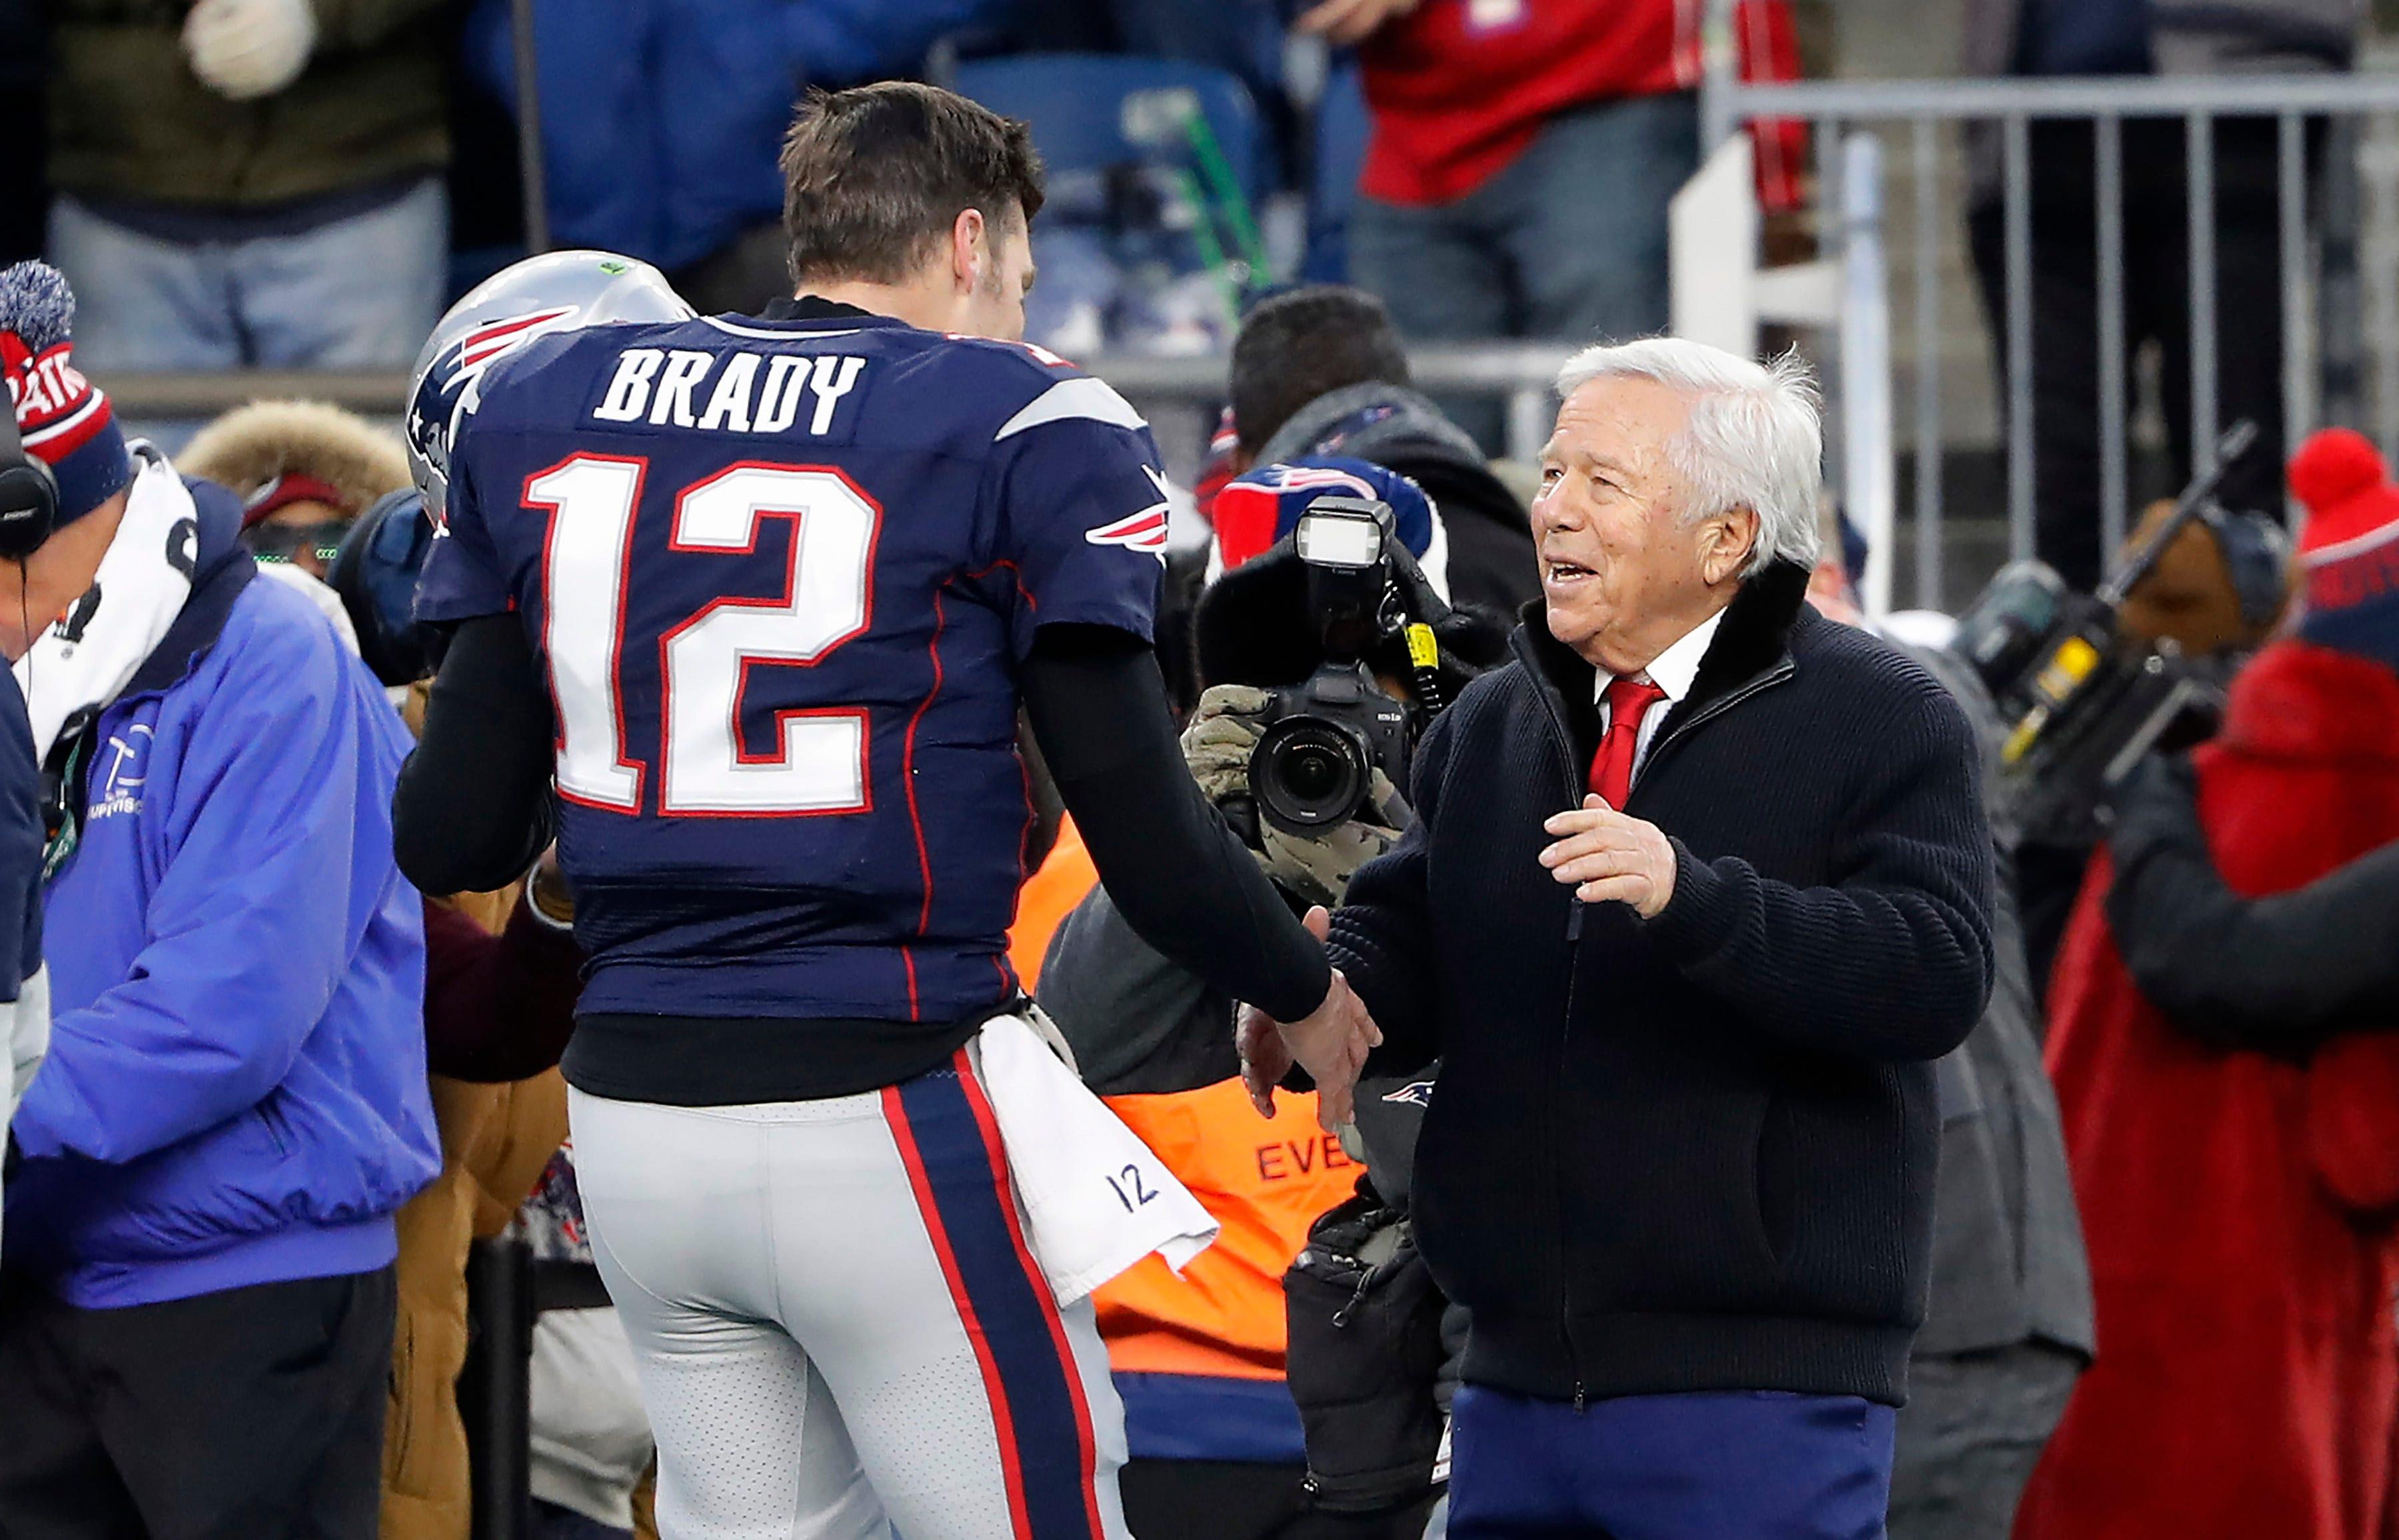 Tom Brady: Patriots owner Robert Kraft's 'hope and prayer' is he stays